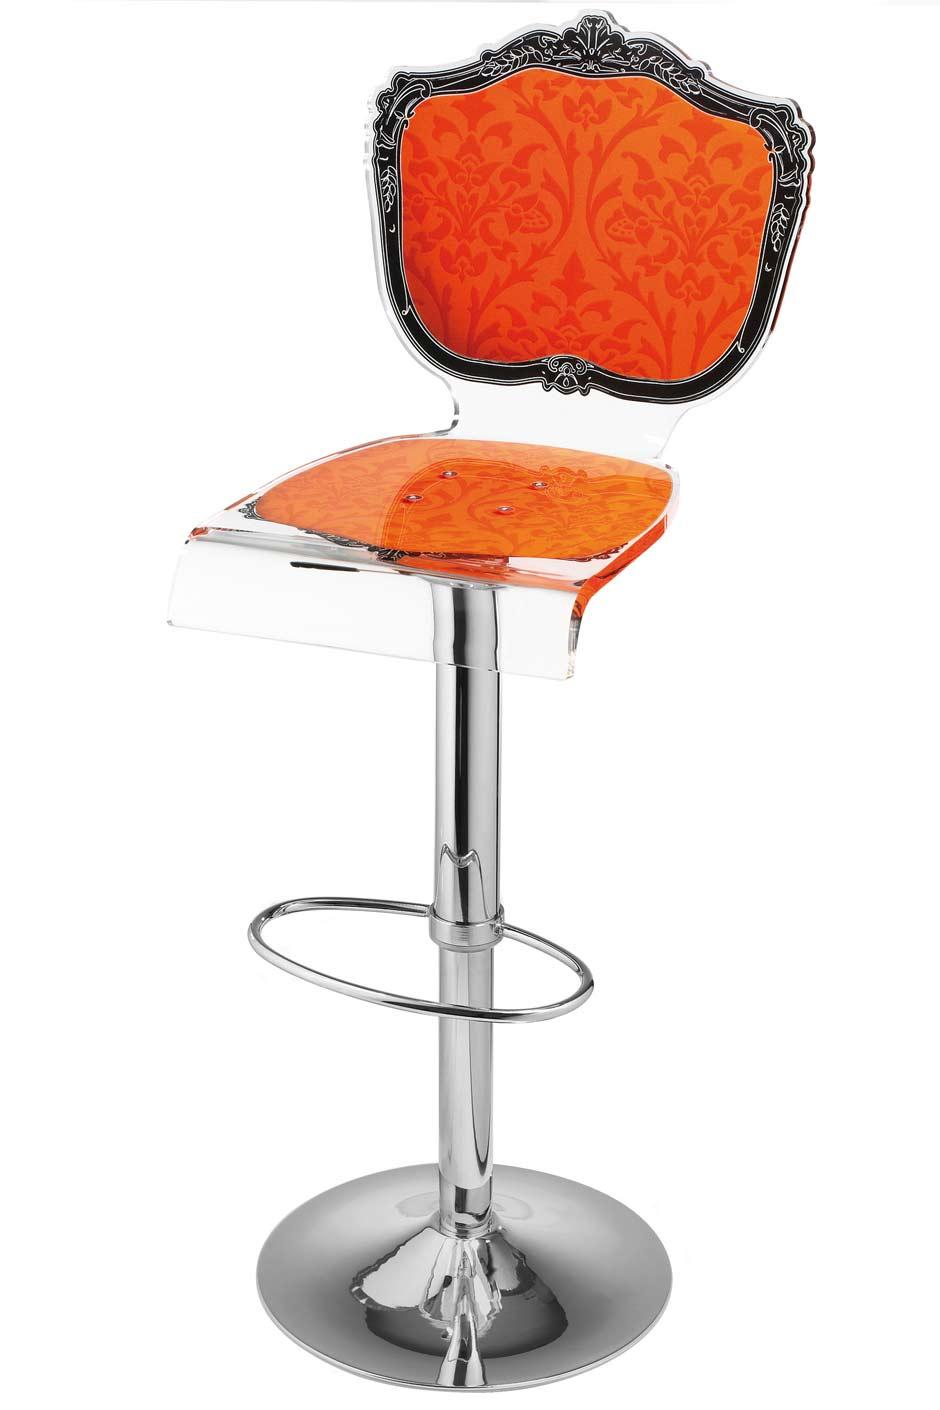 tabouret baroque en plexiglas motif orange acrila sp cialiste du plexiglas r f 11030367. Black Bedroom Furniture Sets. Home Design Ideas